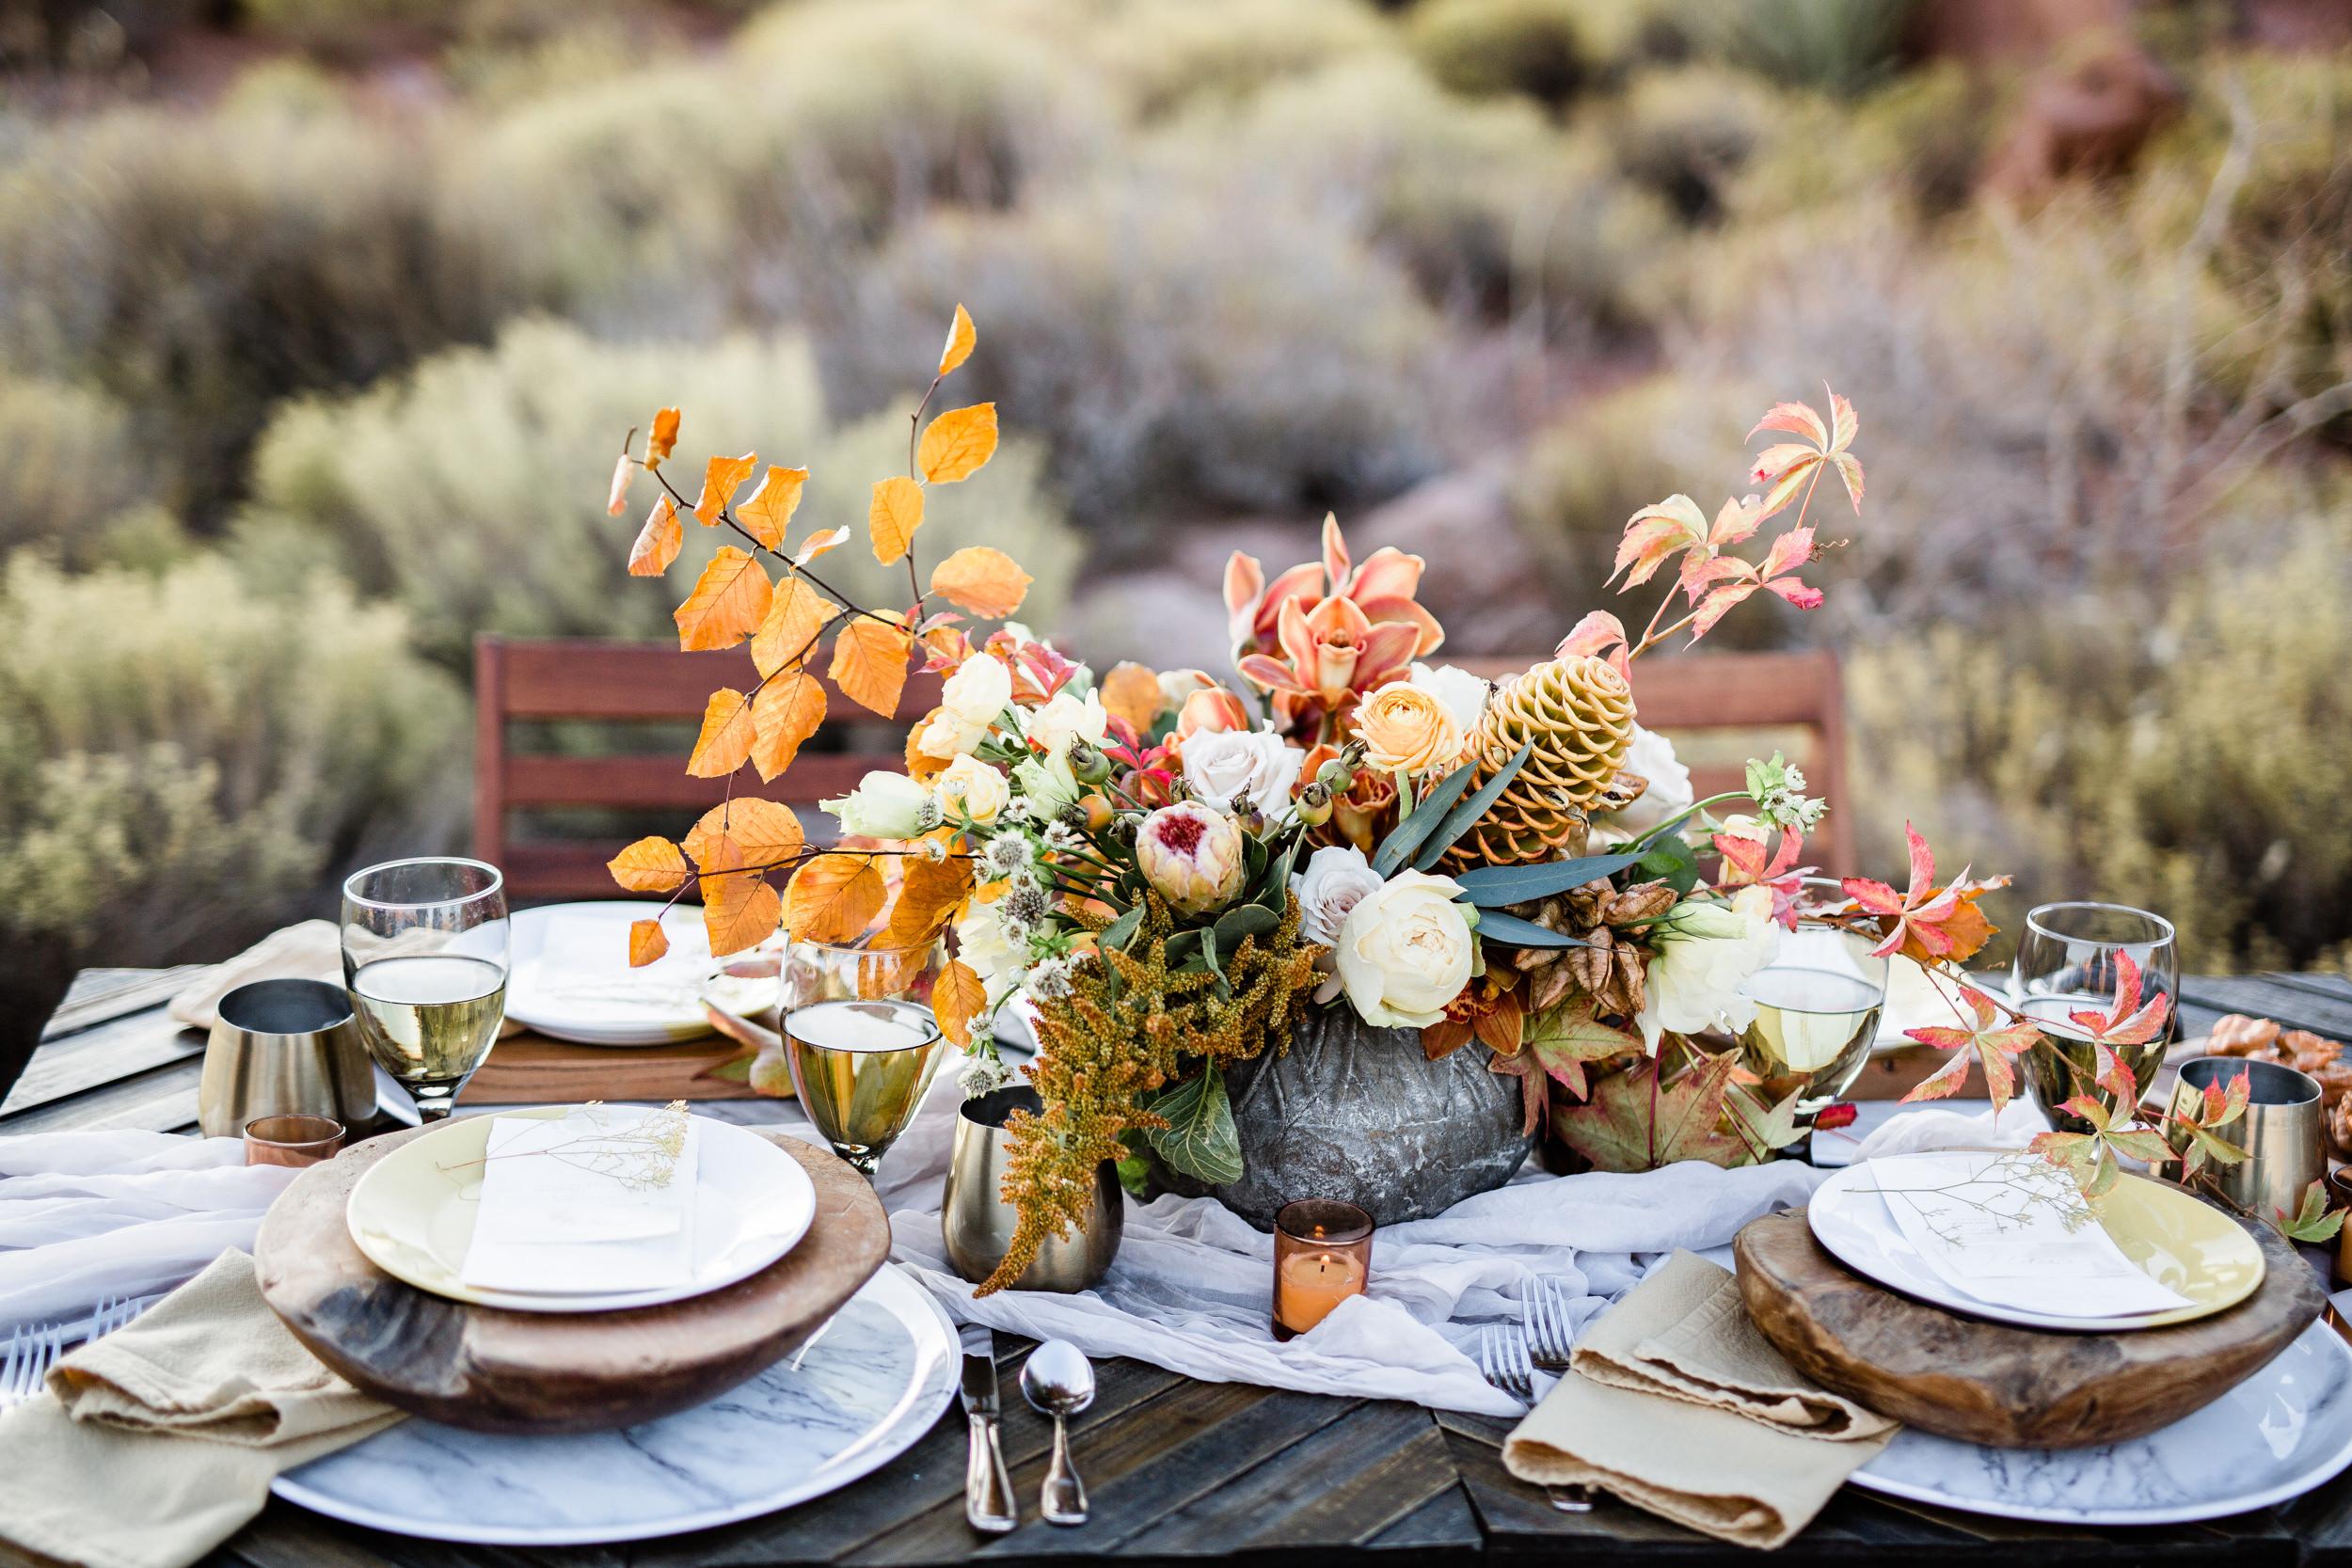 Maccoy dean Portland oregon fine art bright clean wedding engagement photographer Elopement table setting-1.jpg